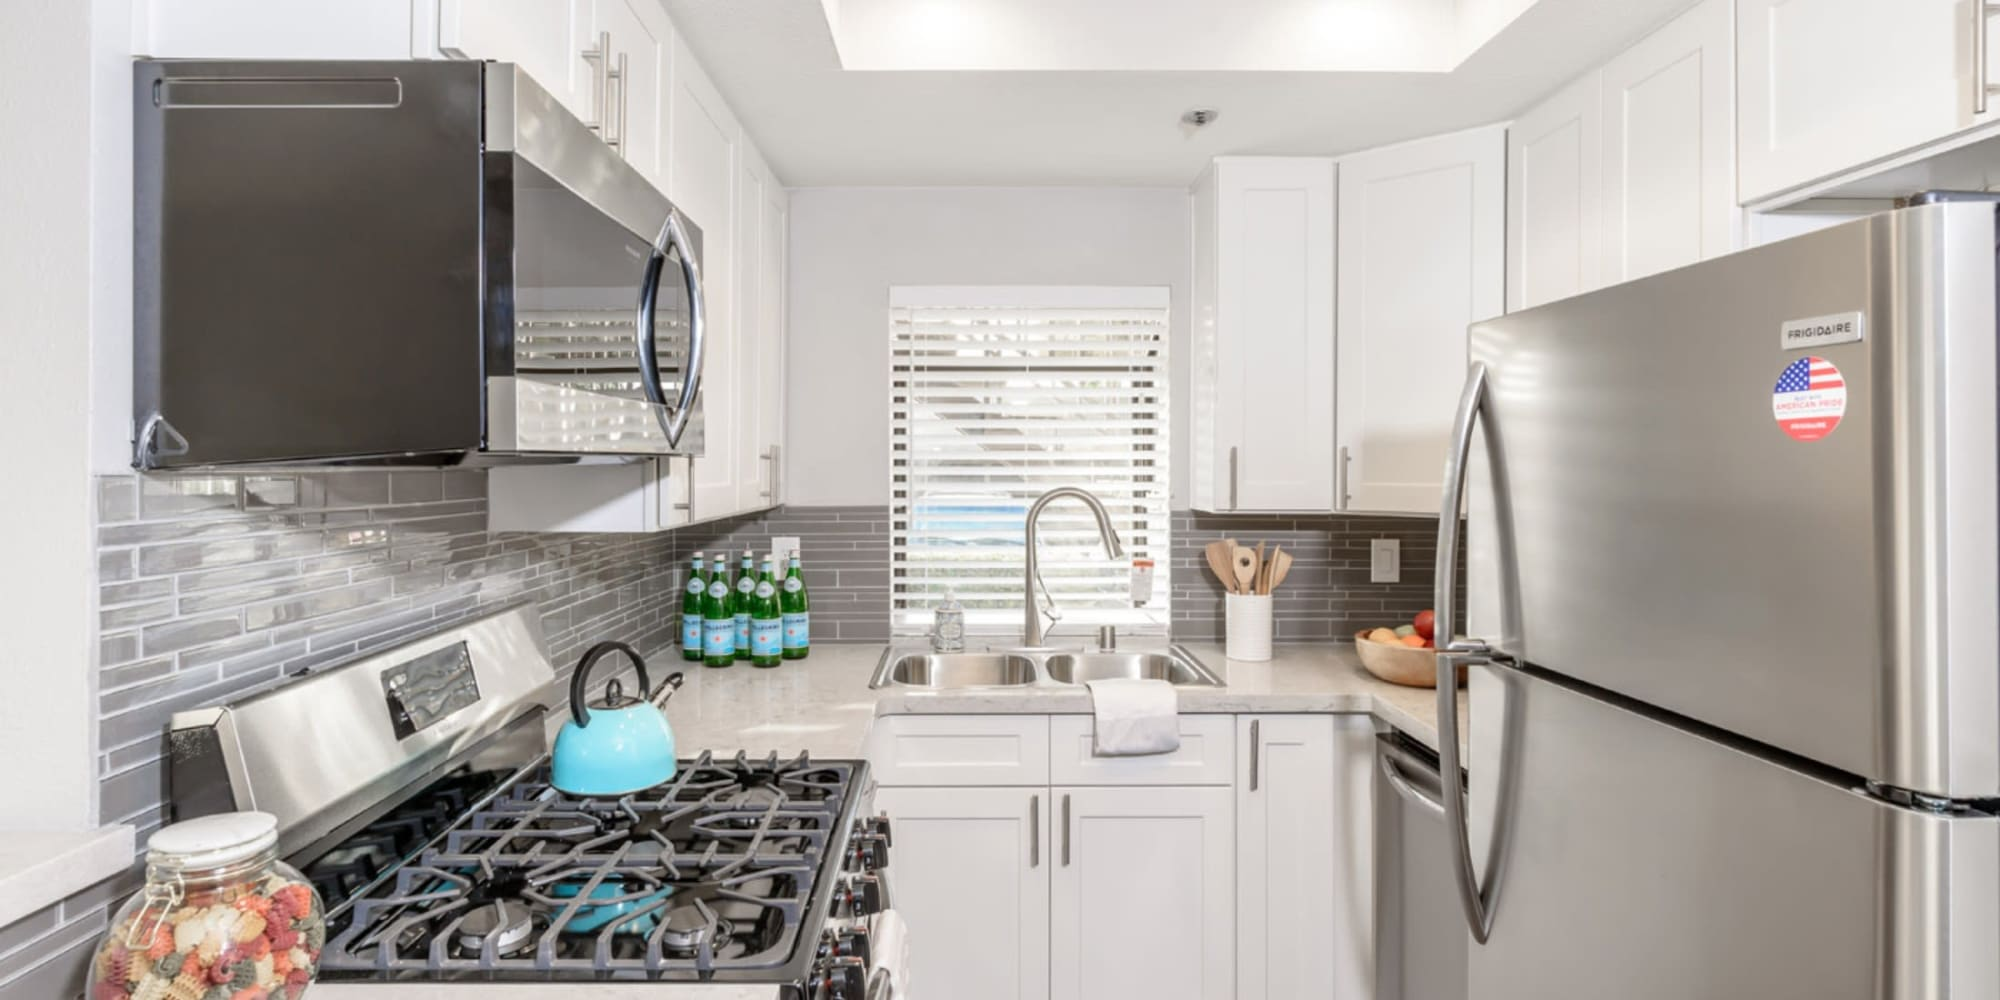 Very modern looking kitchen with new appliances at Sendero Huntington Beach in Huntington Beach, California